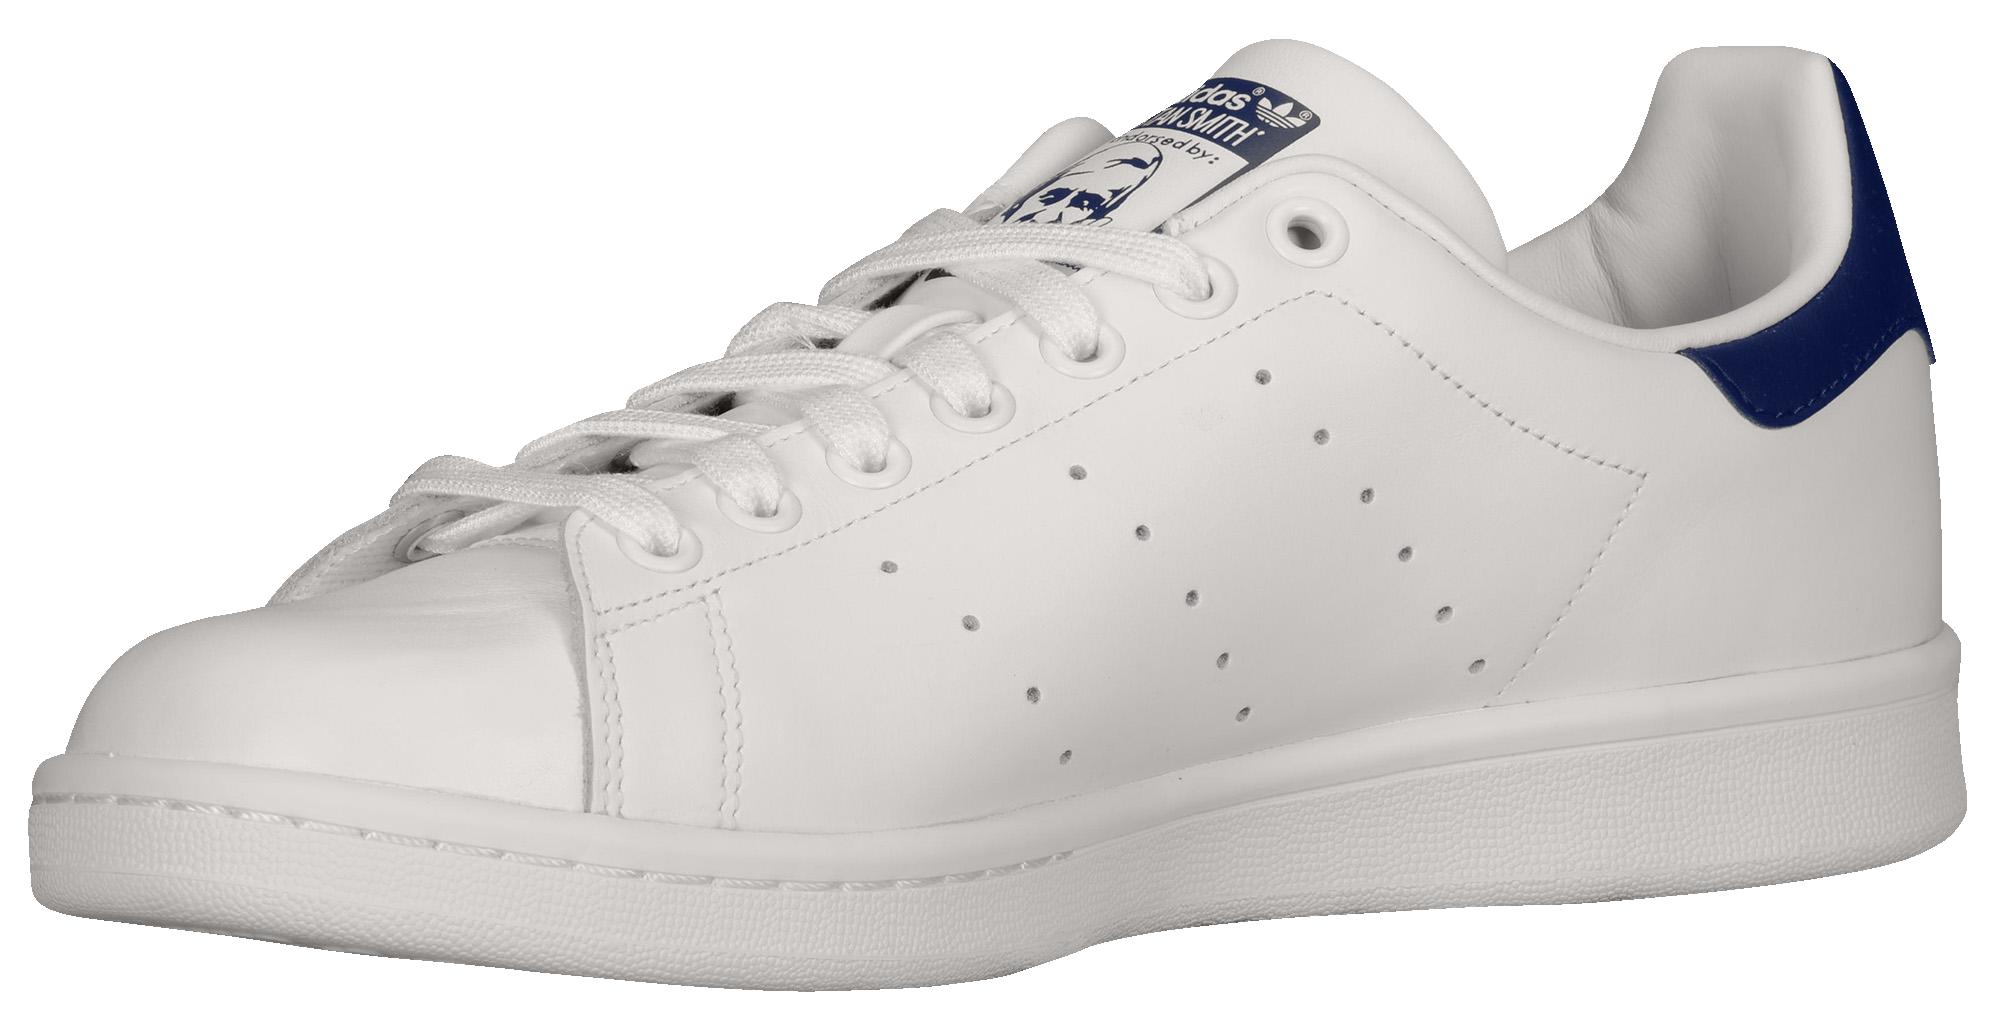 new style b1c86 7311f adidas Originals Stan Smith - Men's